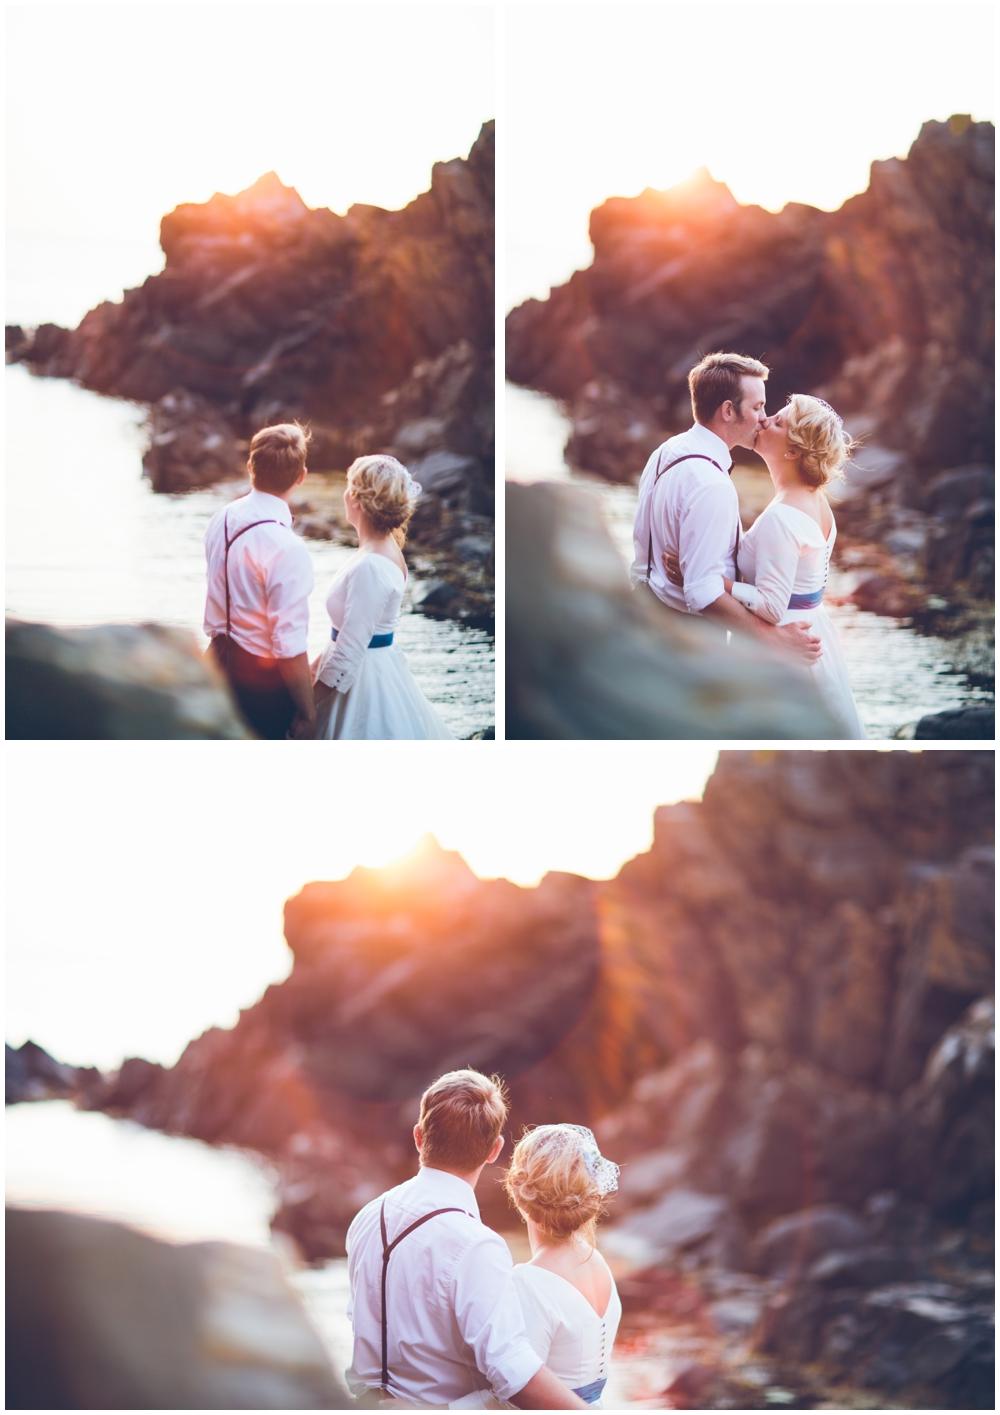 LE HAI LINH Photography-Hochzeitsfotograf-afterweddingshooting-malmoe-schweden_zuooo.jpg